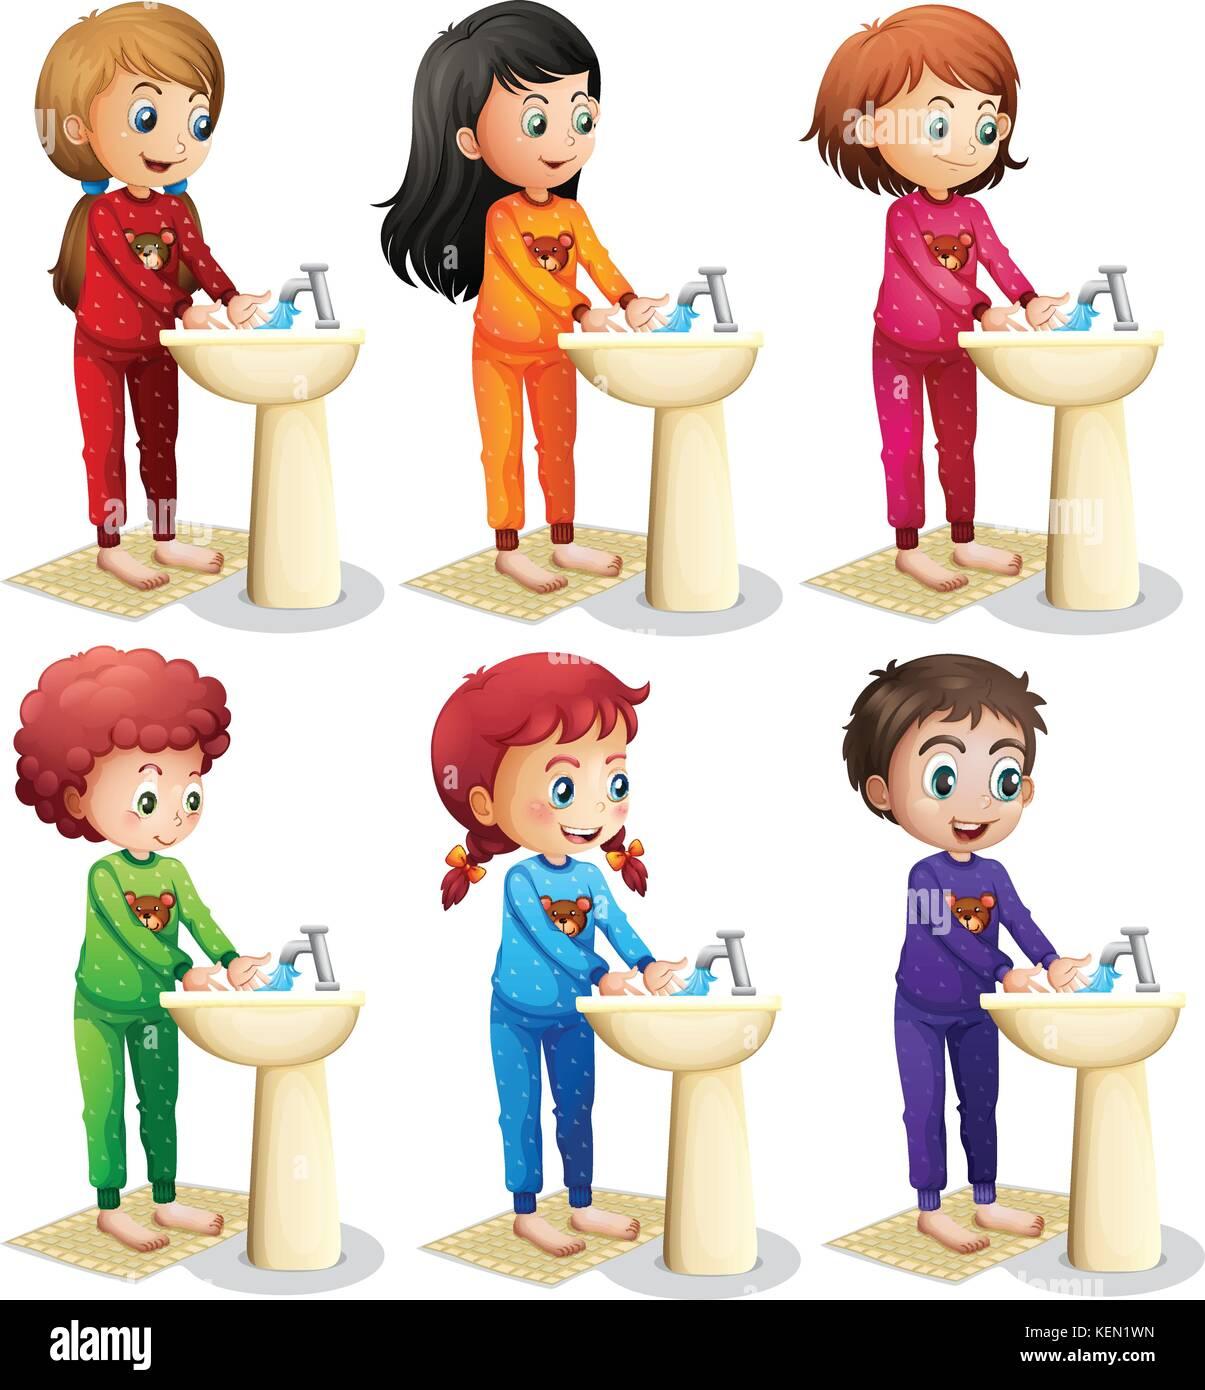 Bathroom Fitters Glasgow >> School Washroom Stock Photos & School Washroom Stock Images - Alamy